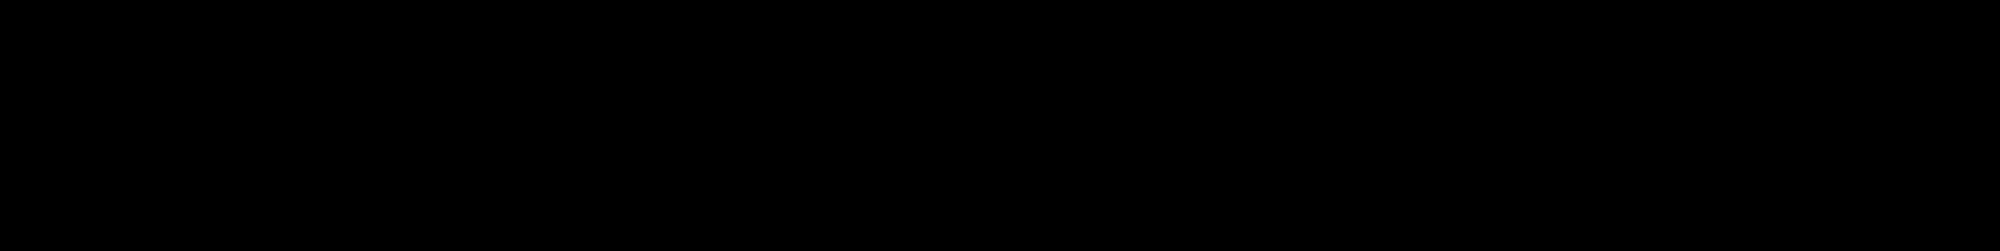 Suomen dry needling yhdistys